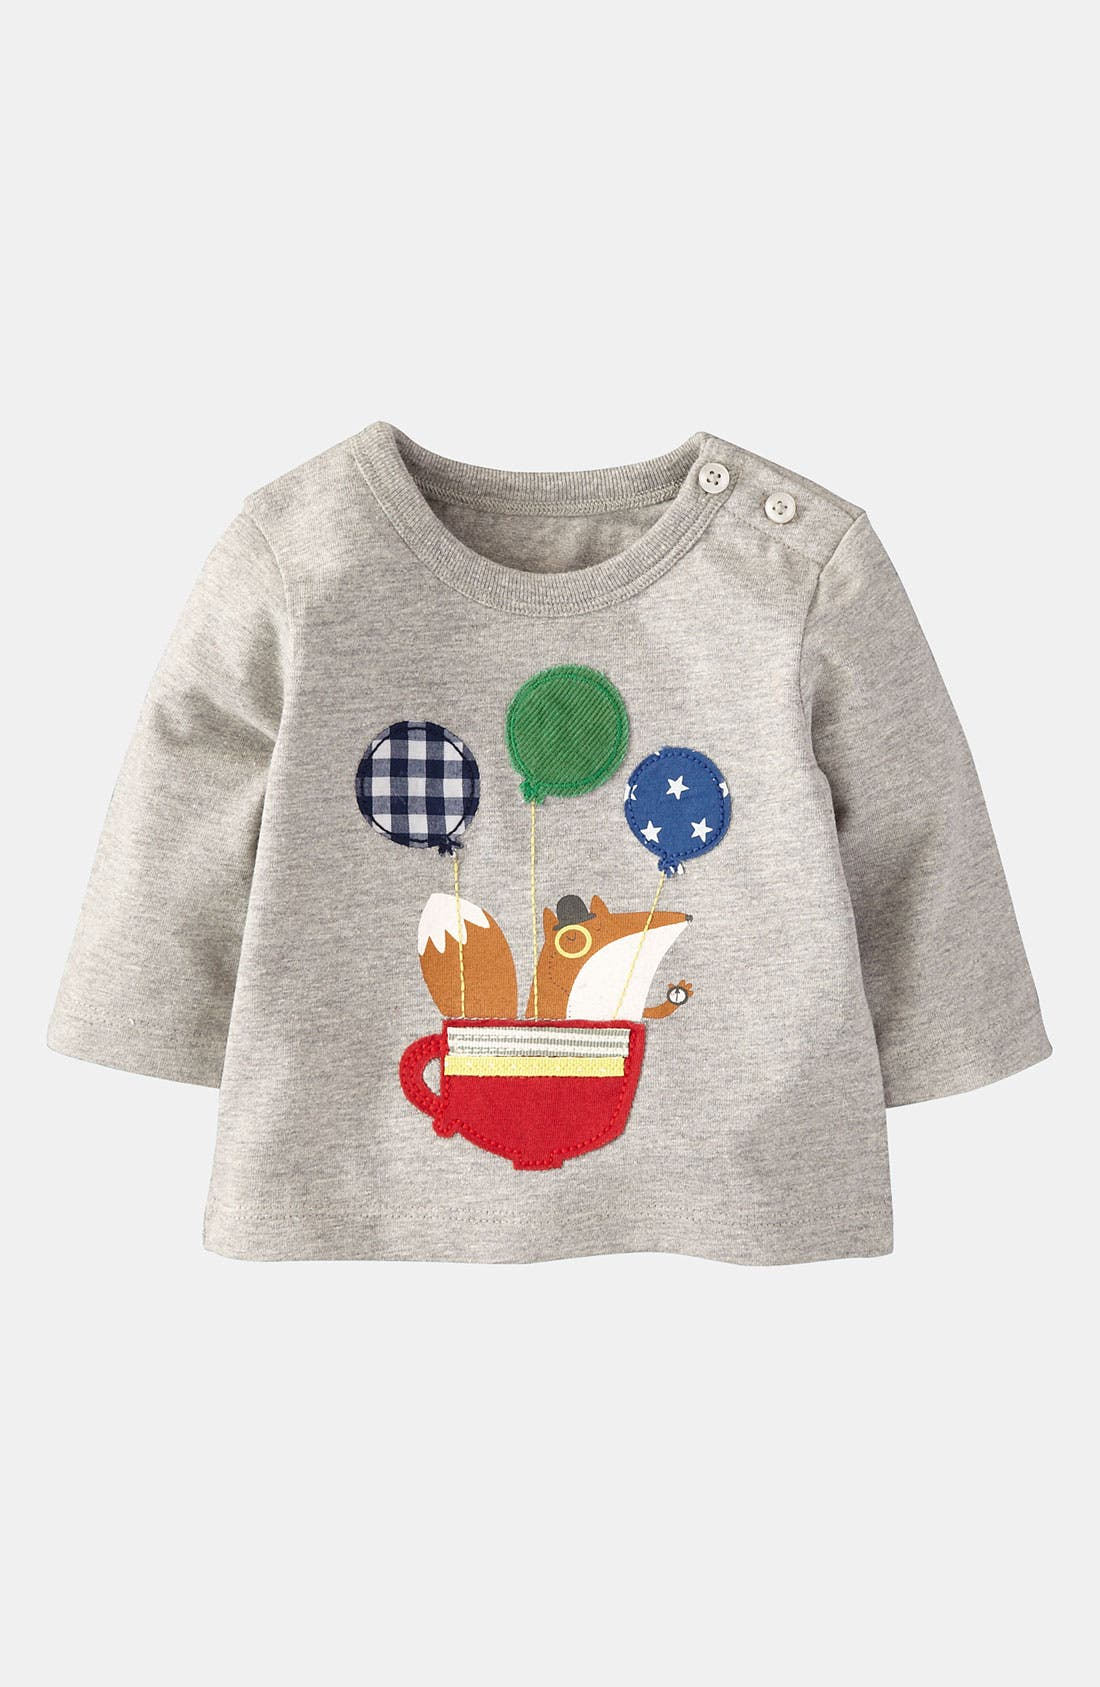 Main Image - Mini Boden 'Animal Adventures' T-Shirt (Infant)